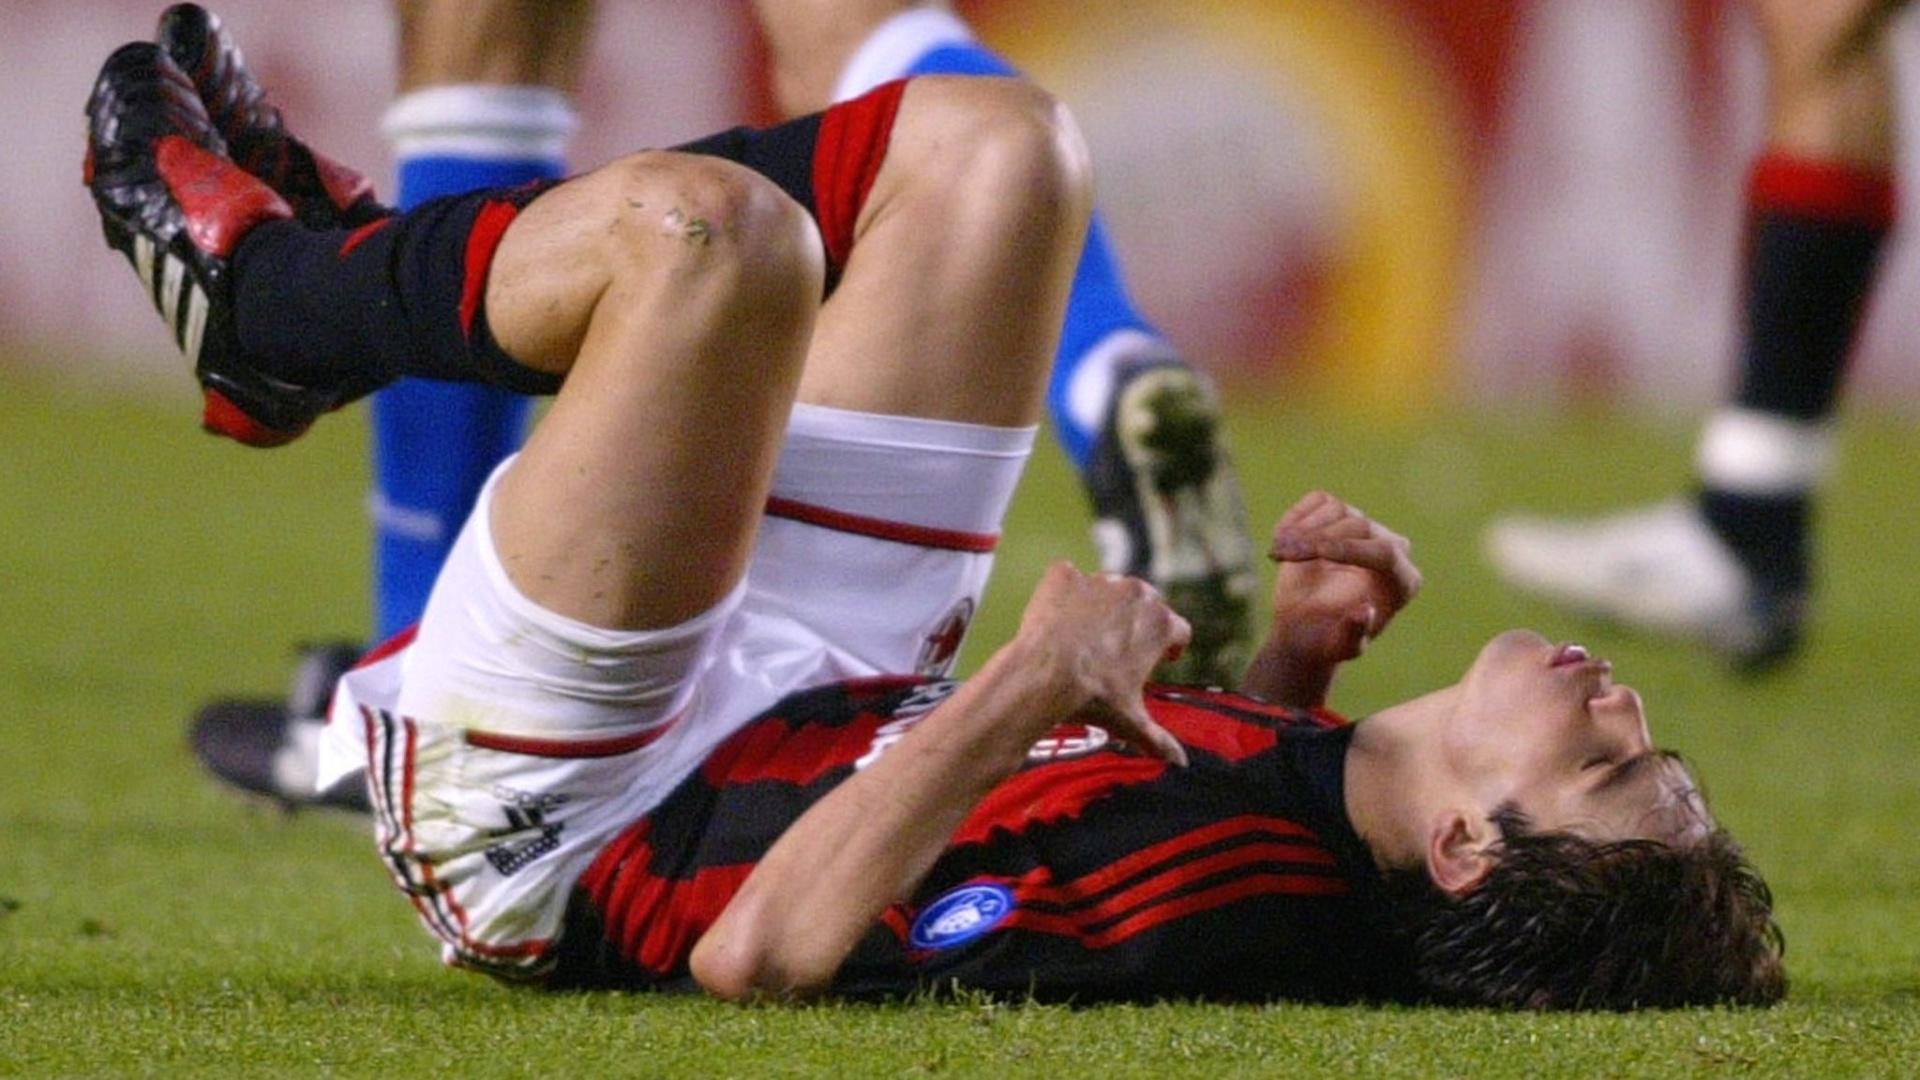 Kaká, meia do Milan, lamenta a derrota do time por 4 a 0 para o La Coruña, na Liga dos Campeões de 2003/04